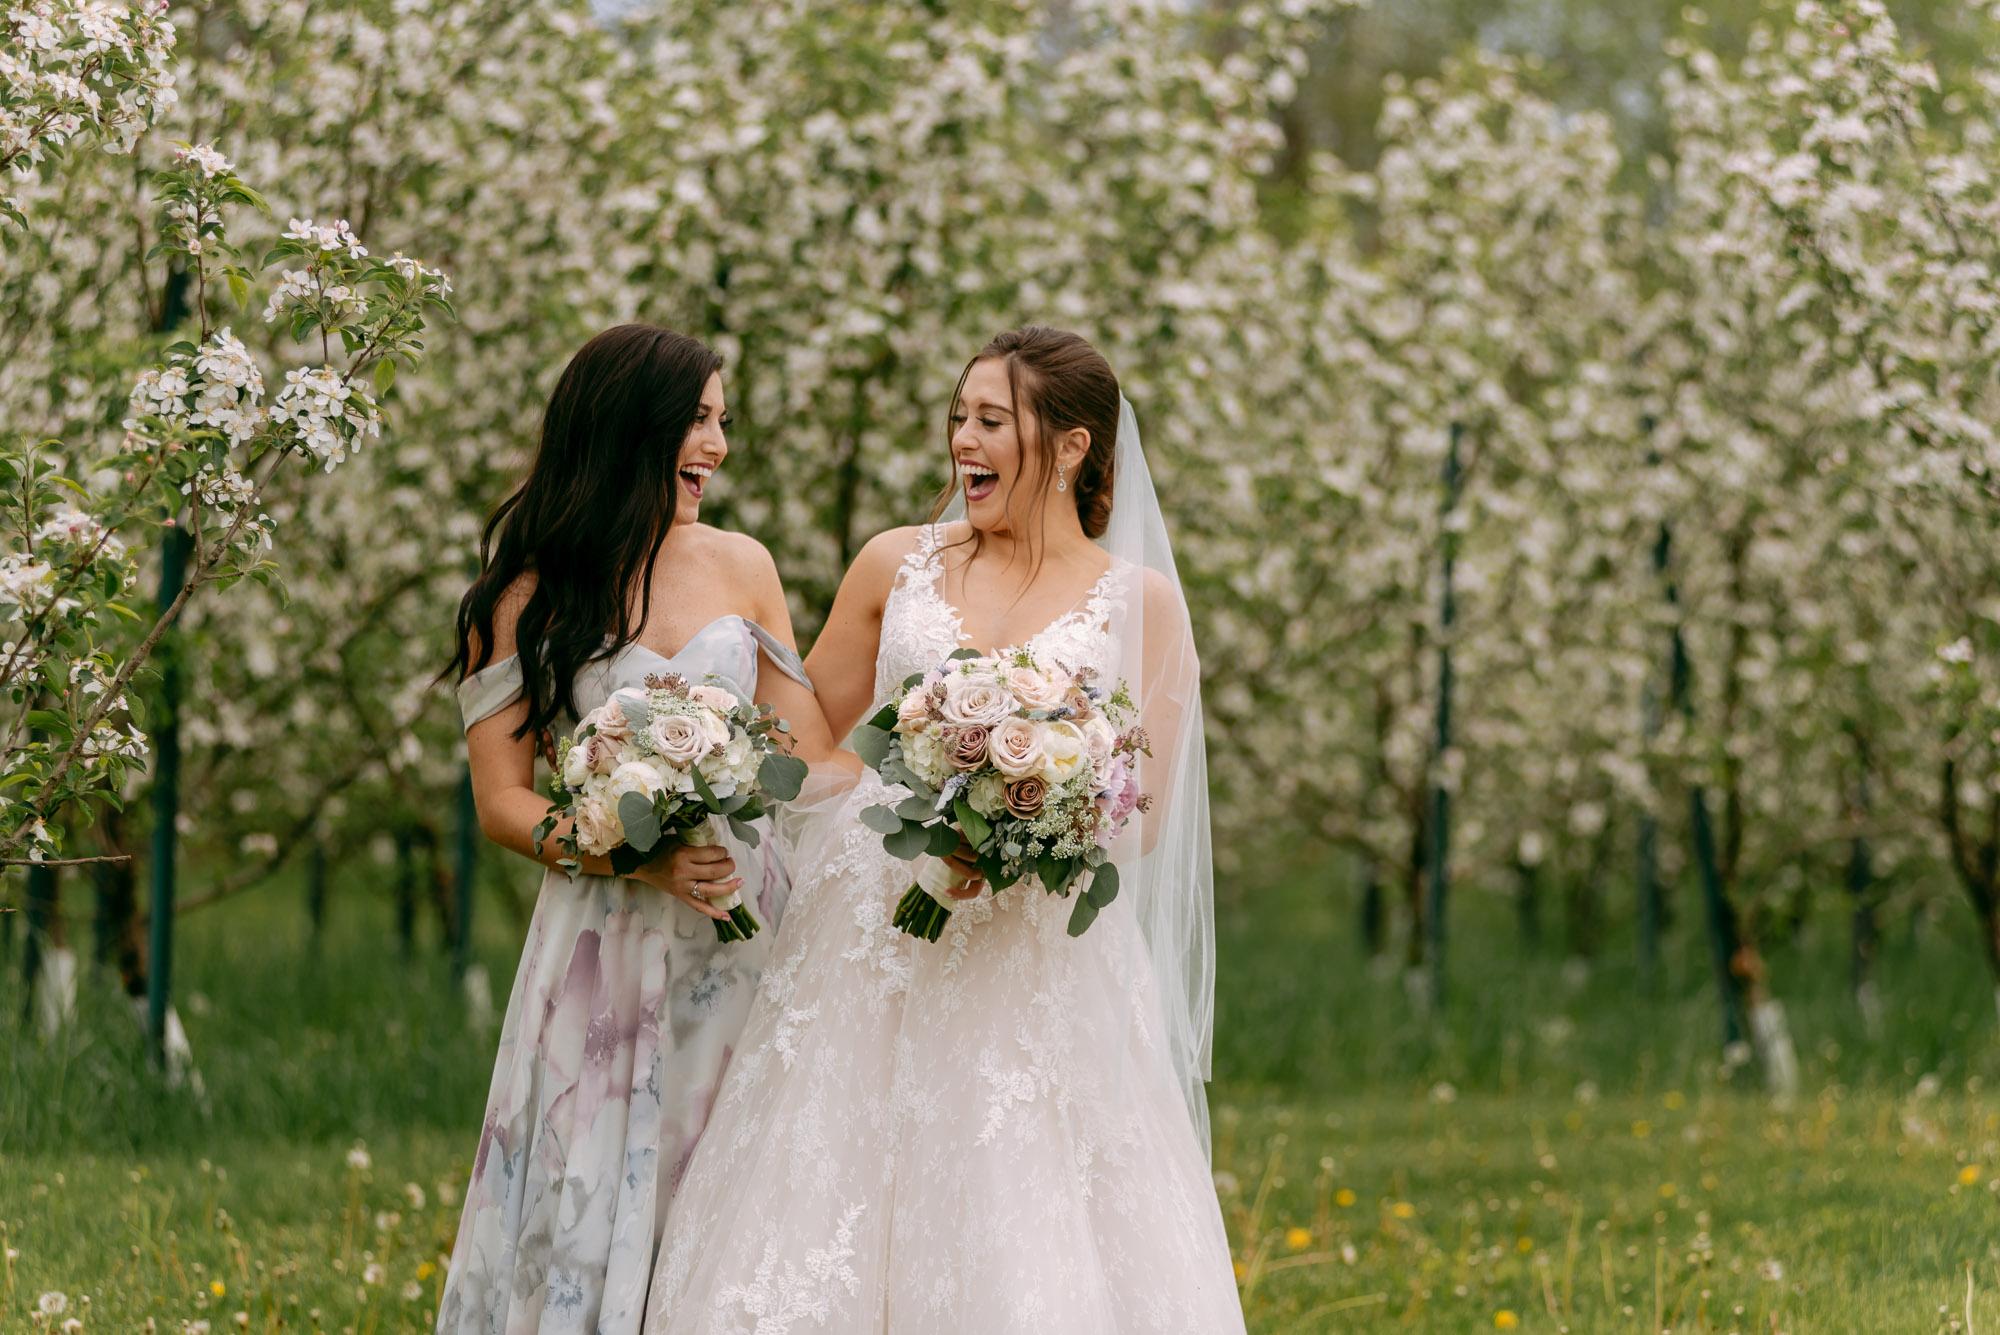 orchard-farms-pavillion-wedding-rockton-IL-wedding-photographers-123.jpg